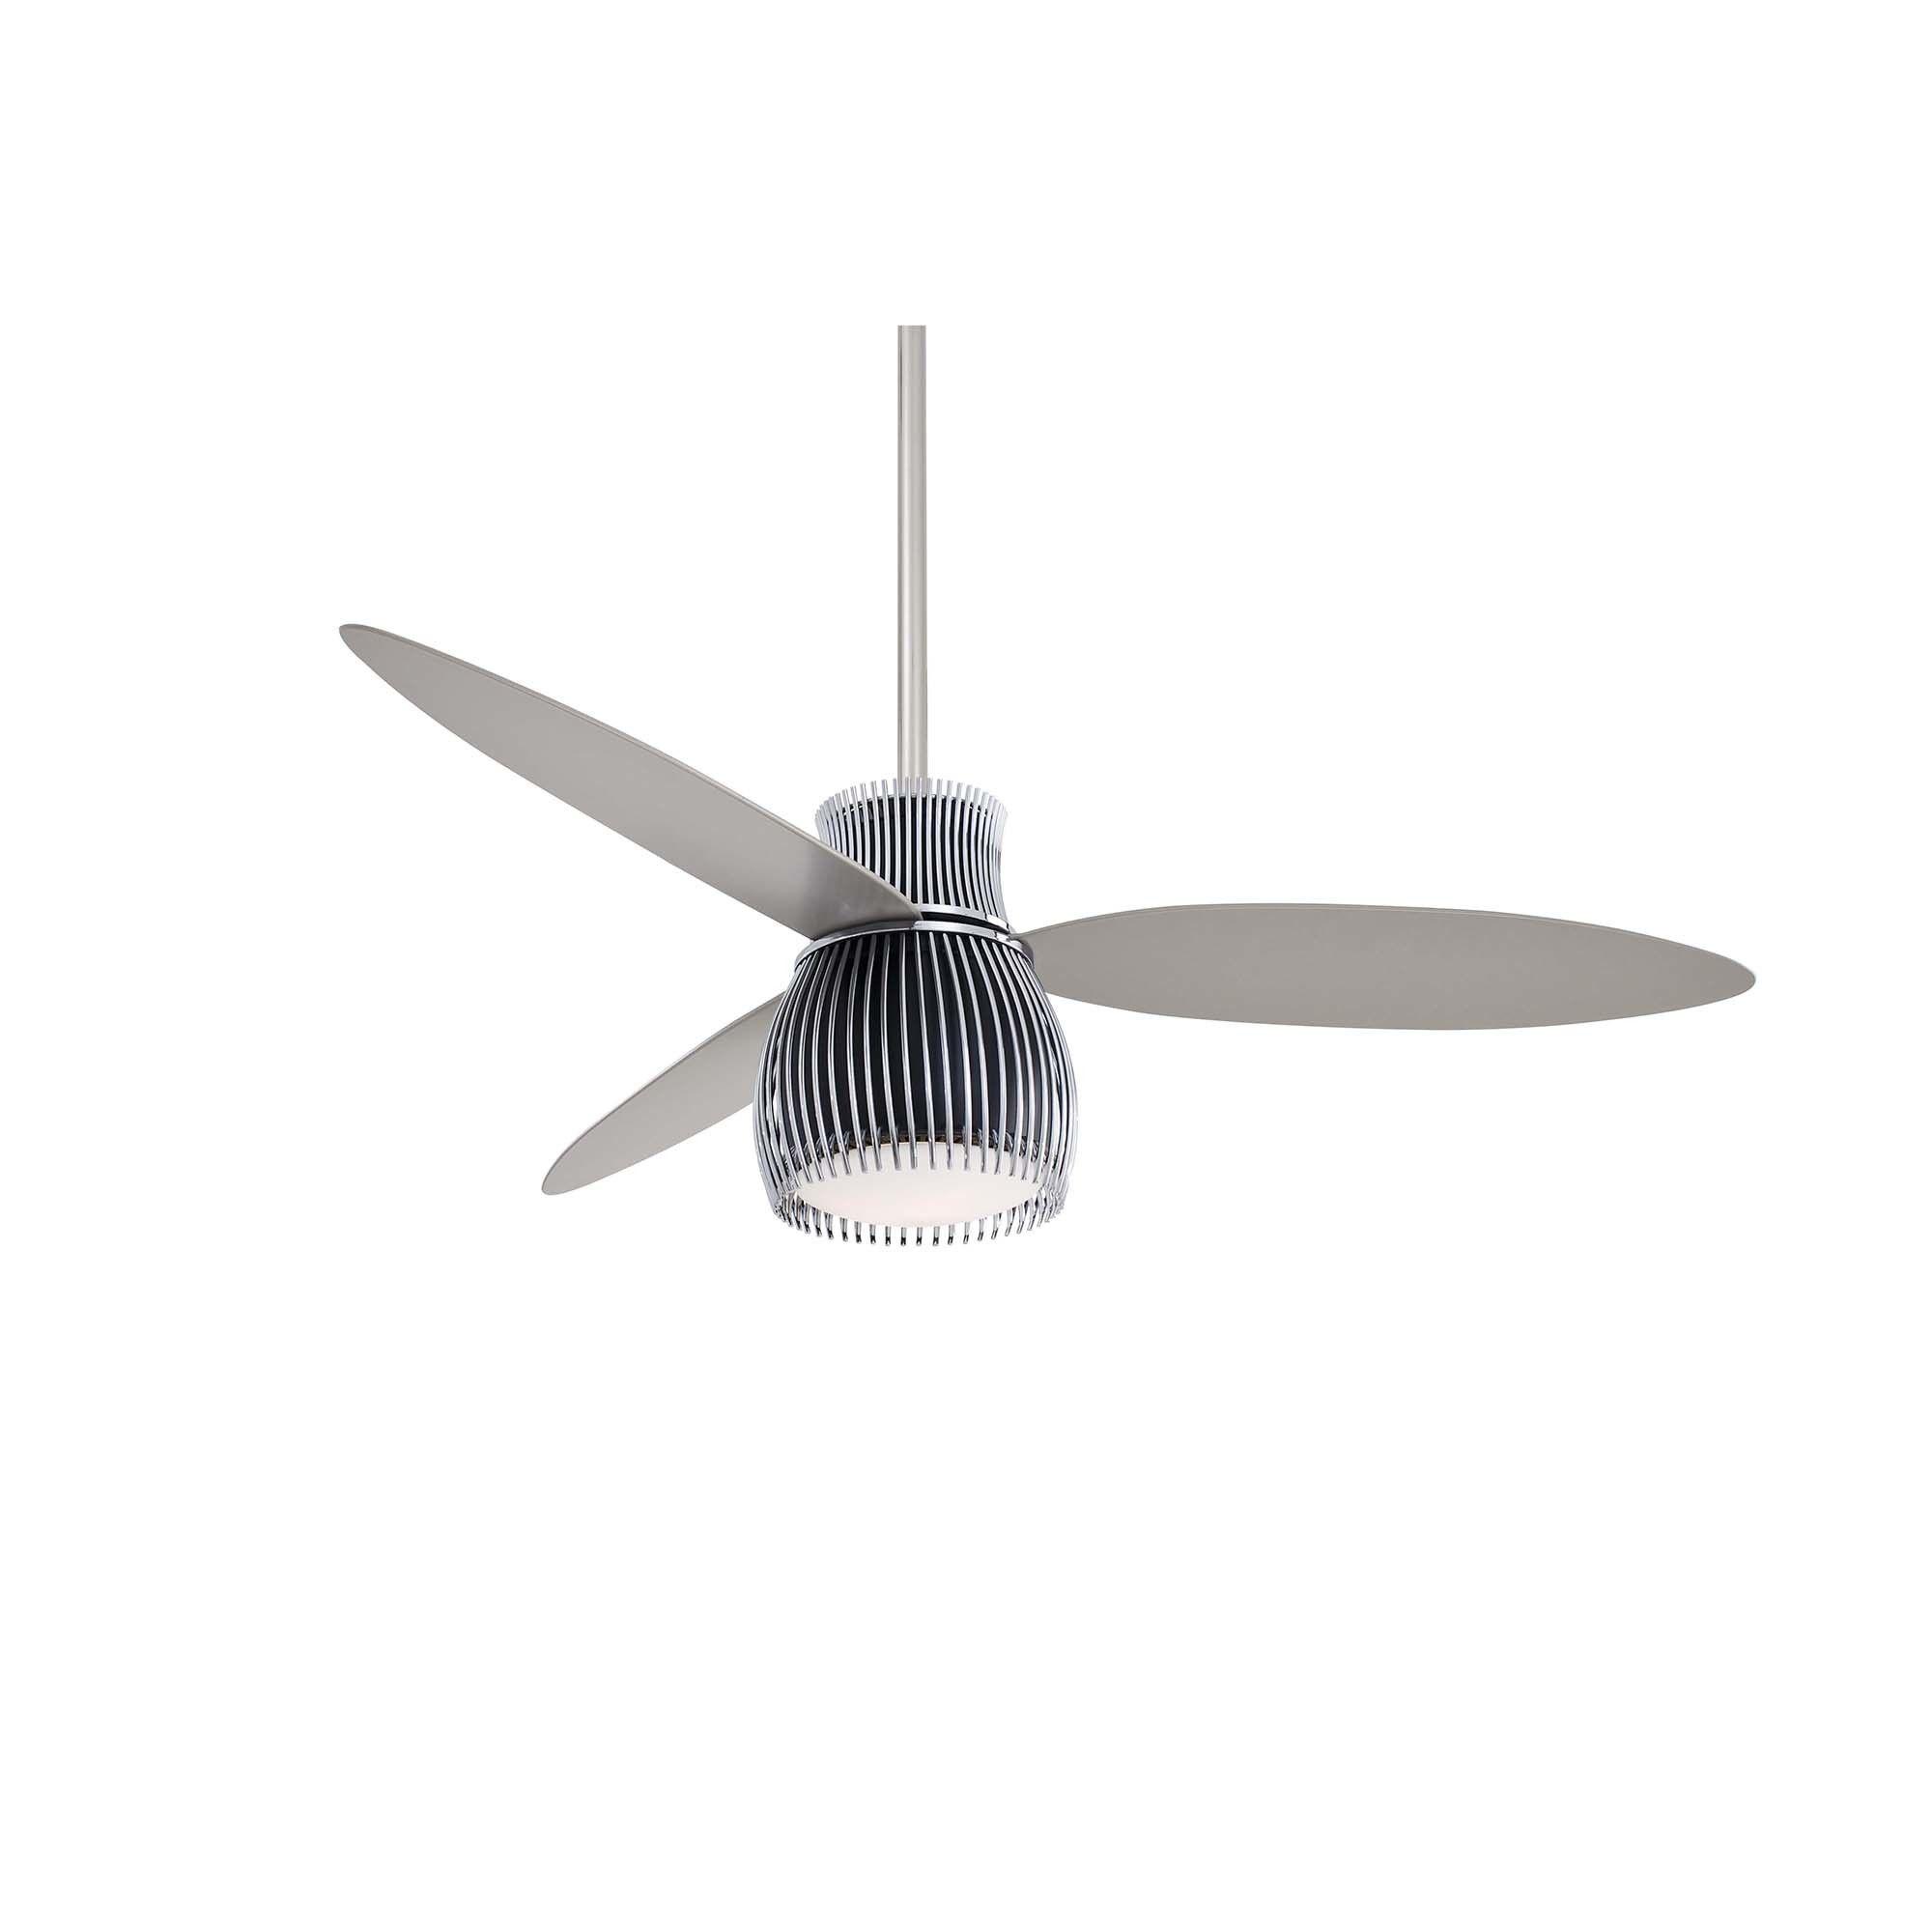 ceilings fan bajaj in original price blade crystal hs three fans centrim list pearl ceiling india